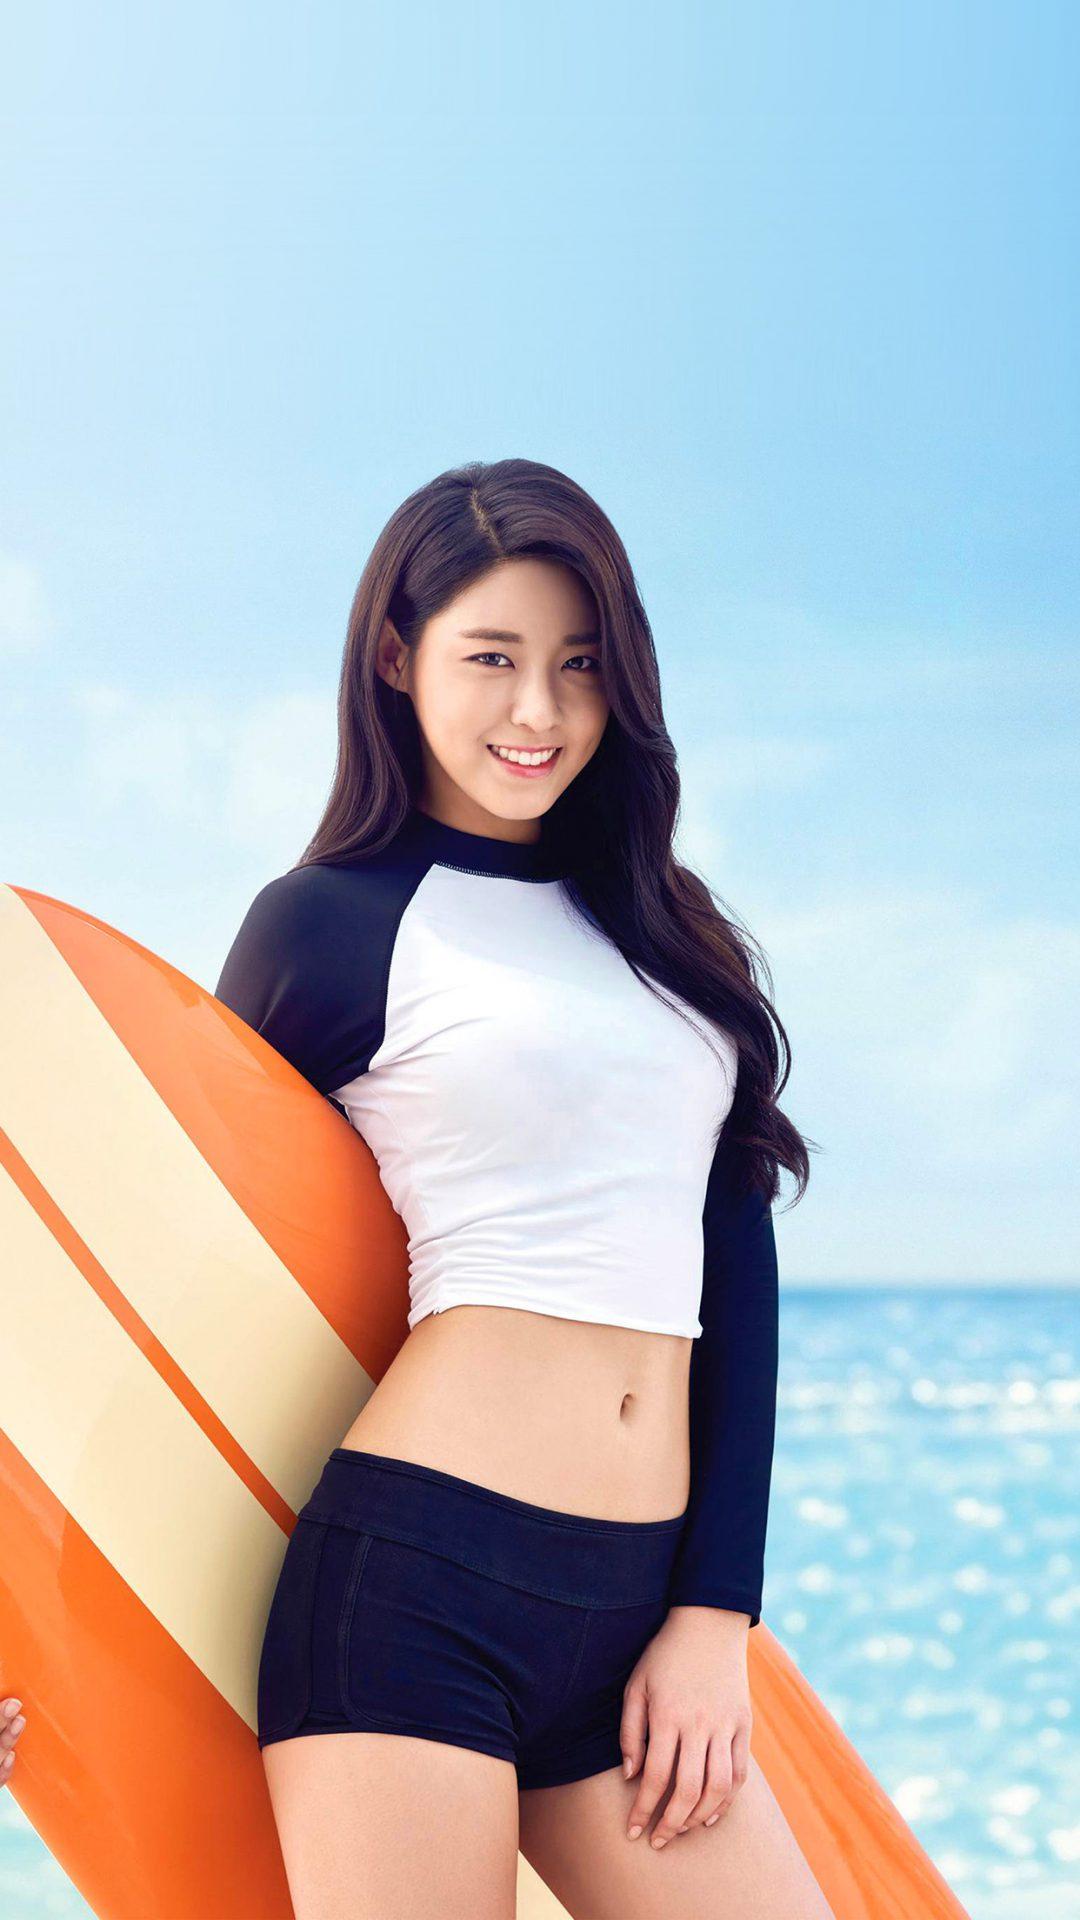 Seolhyun Aoa Kpop Sea Sumner Cute Swimsuit